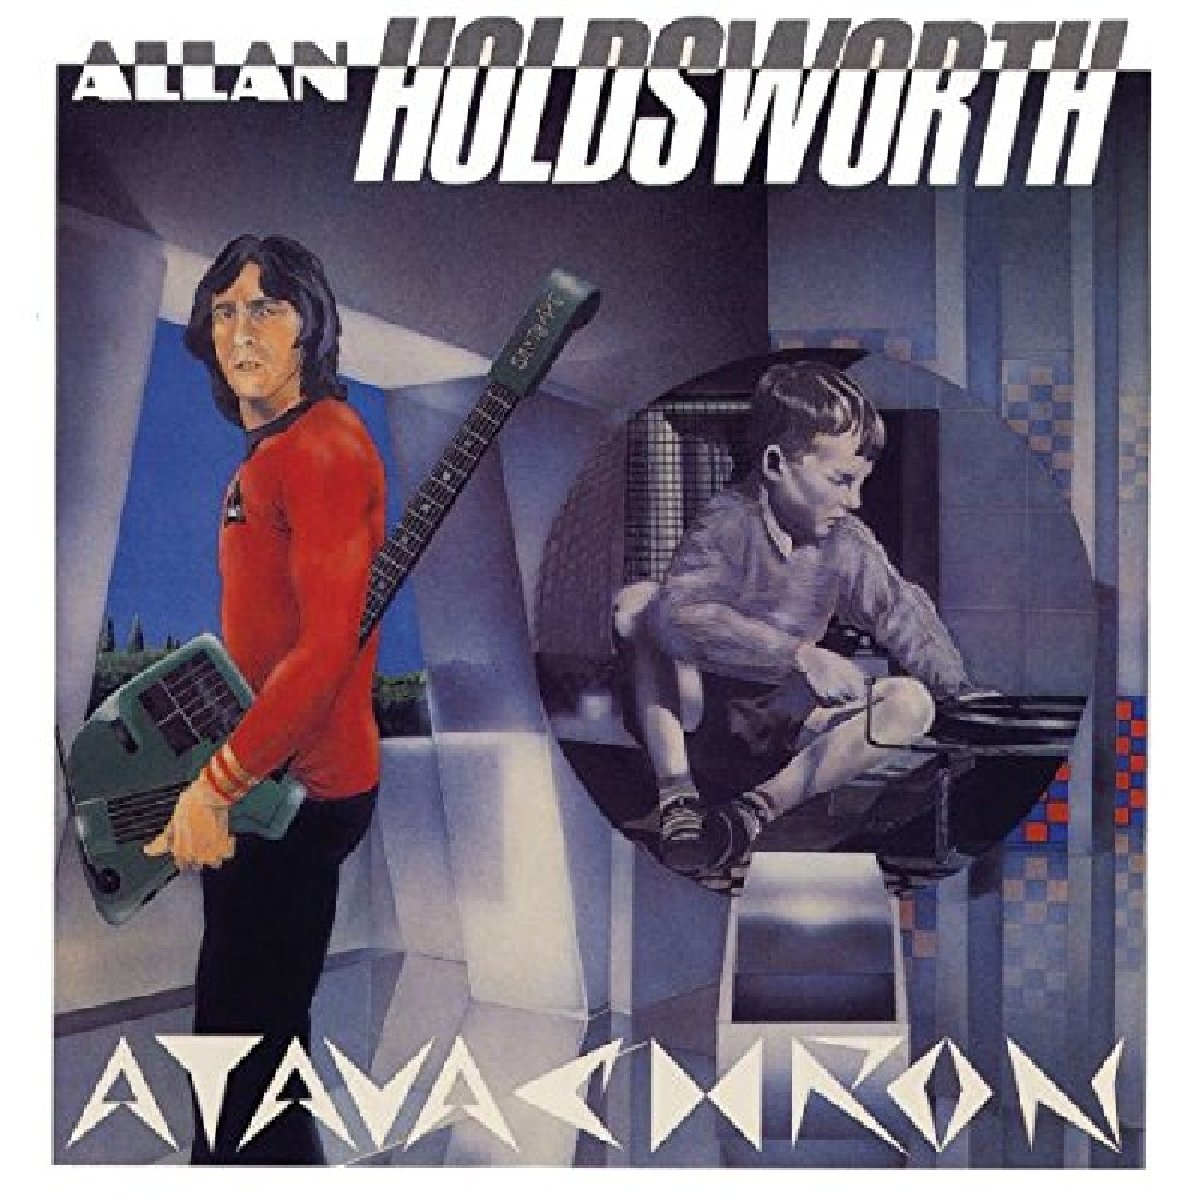 Allan Holdsworth - Atavachron (CD)